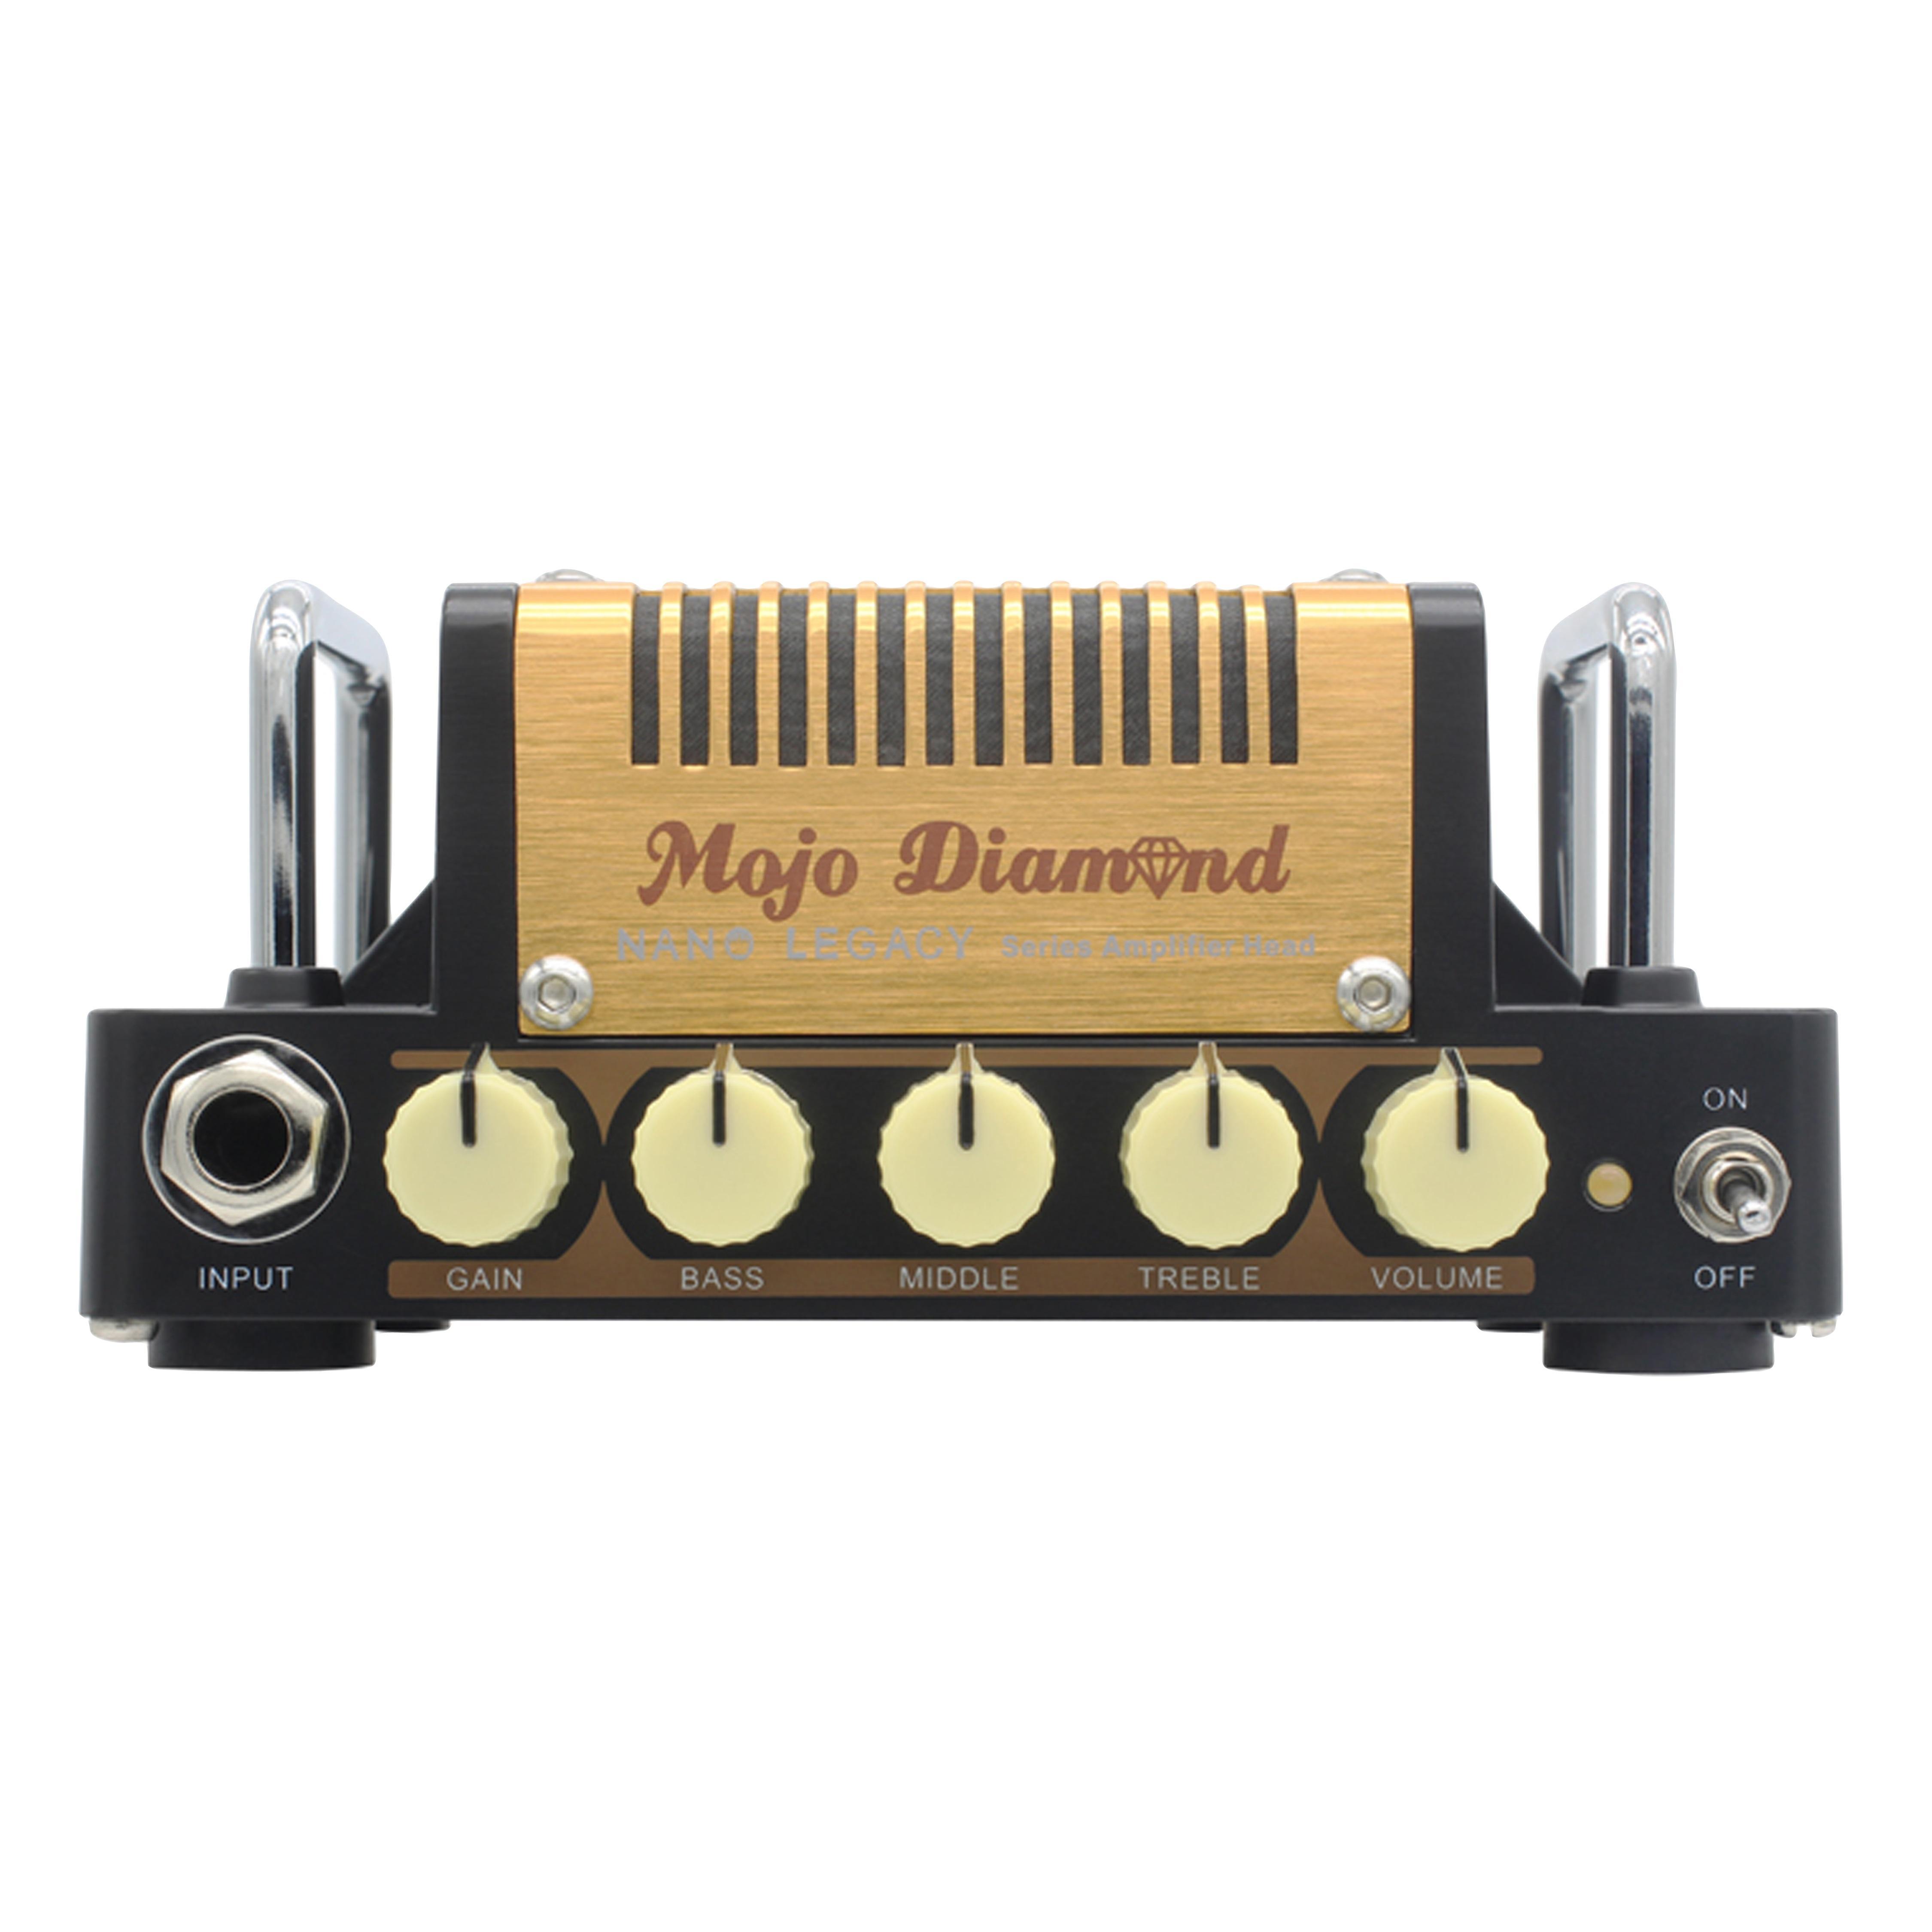 Hotone Mojo Diamond 5 Watt Mini Guitar Amplifier Head Apmilifier Bass Circuit And Explanation View Larger